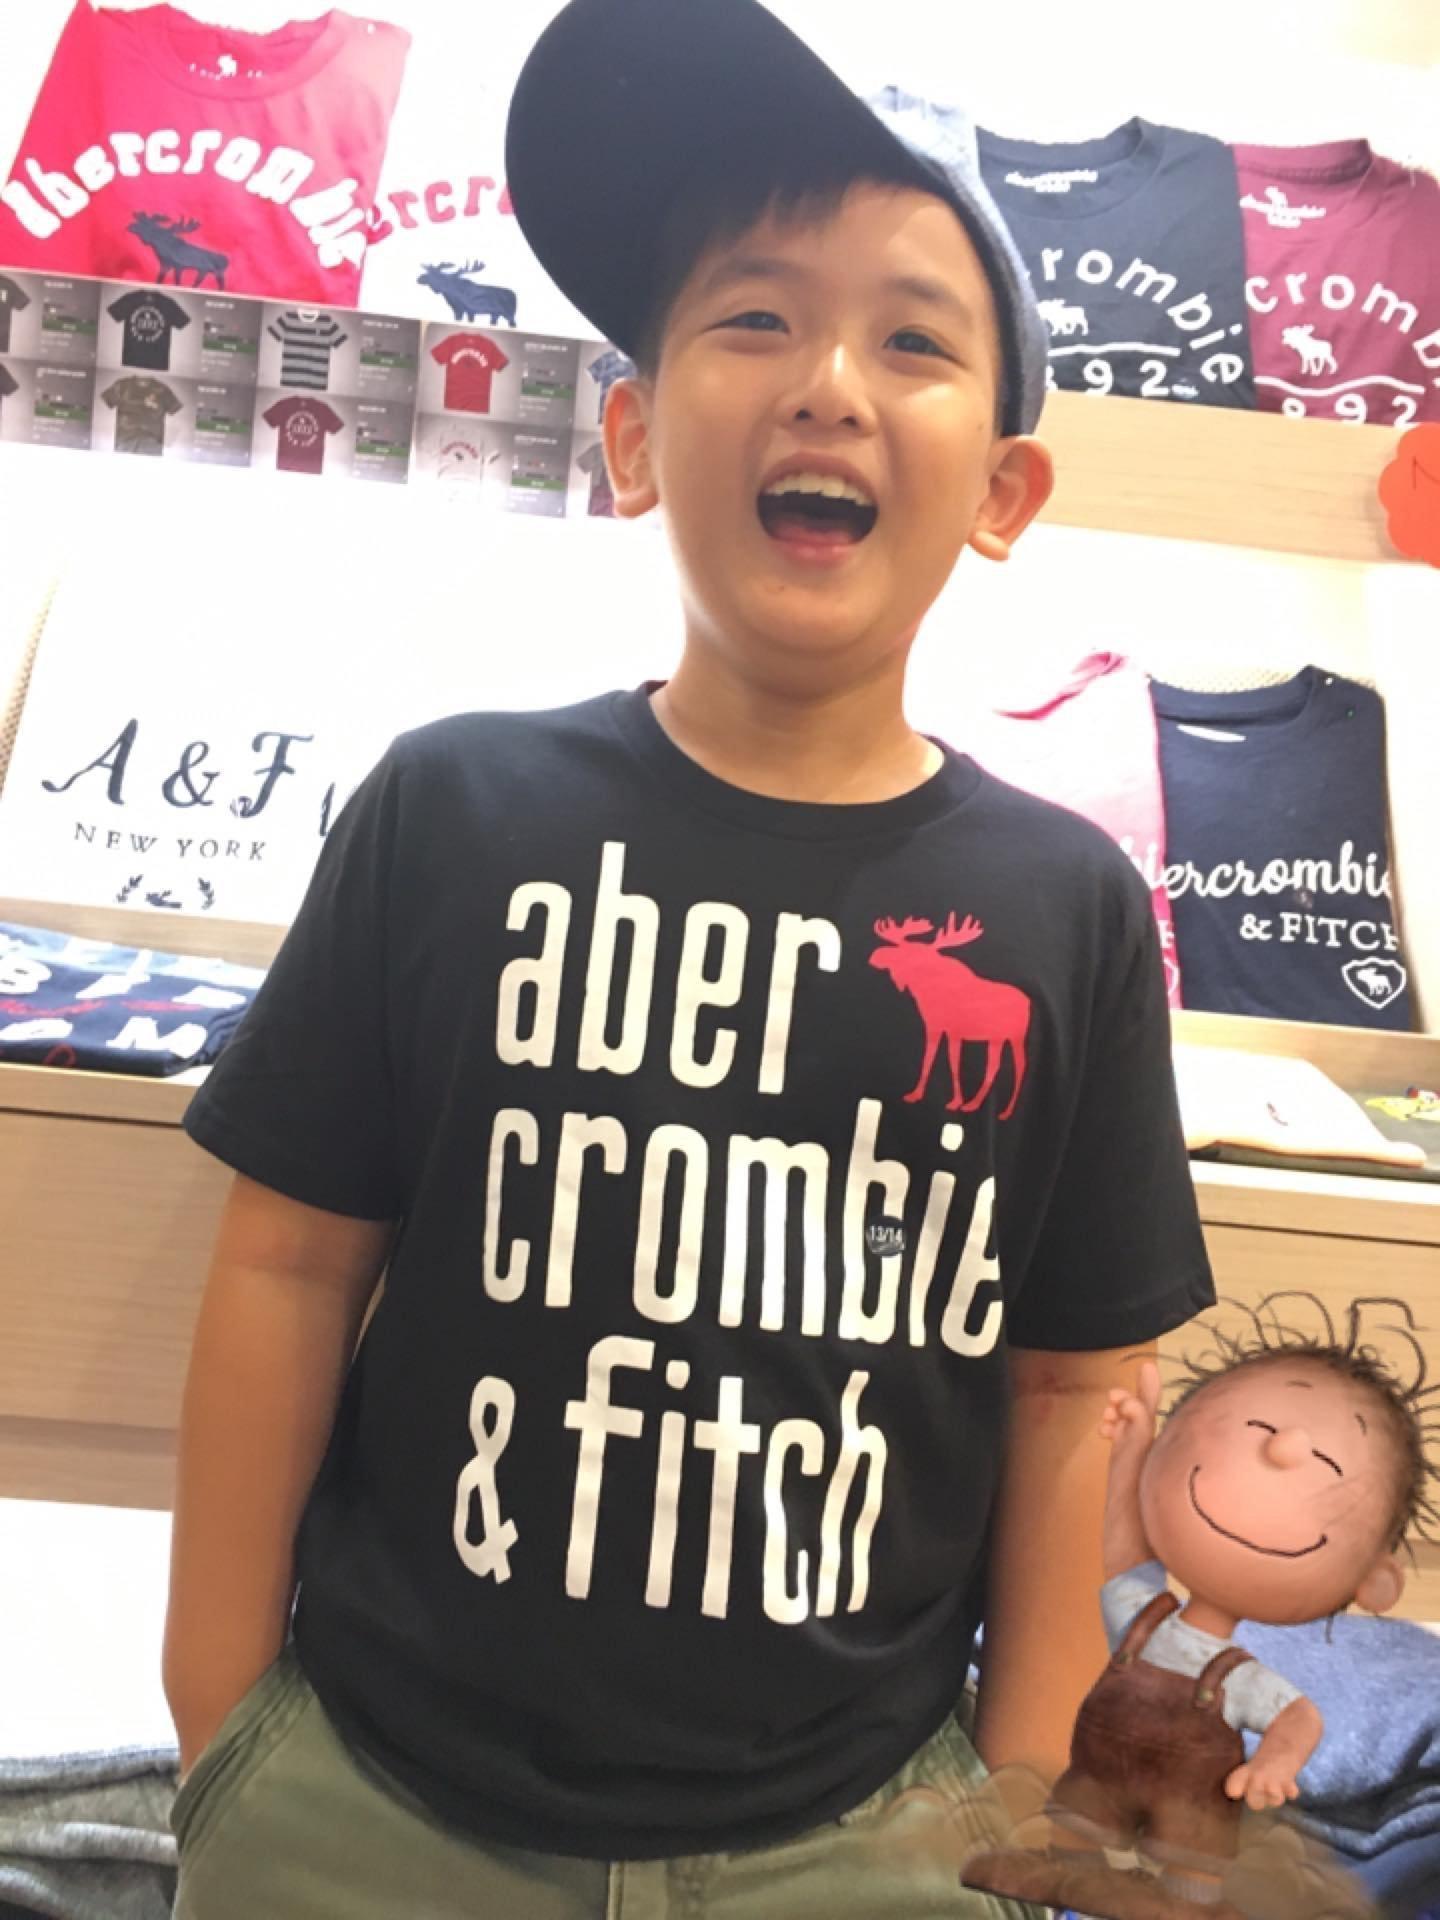 A&F 秋冬新款 男生 黑色短Tee短袖 Abercrombie & Fitch AF